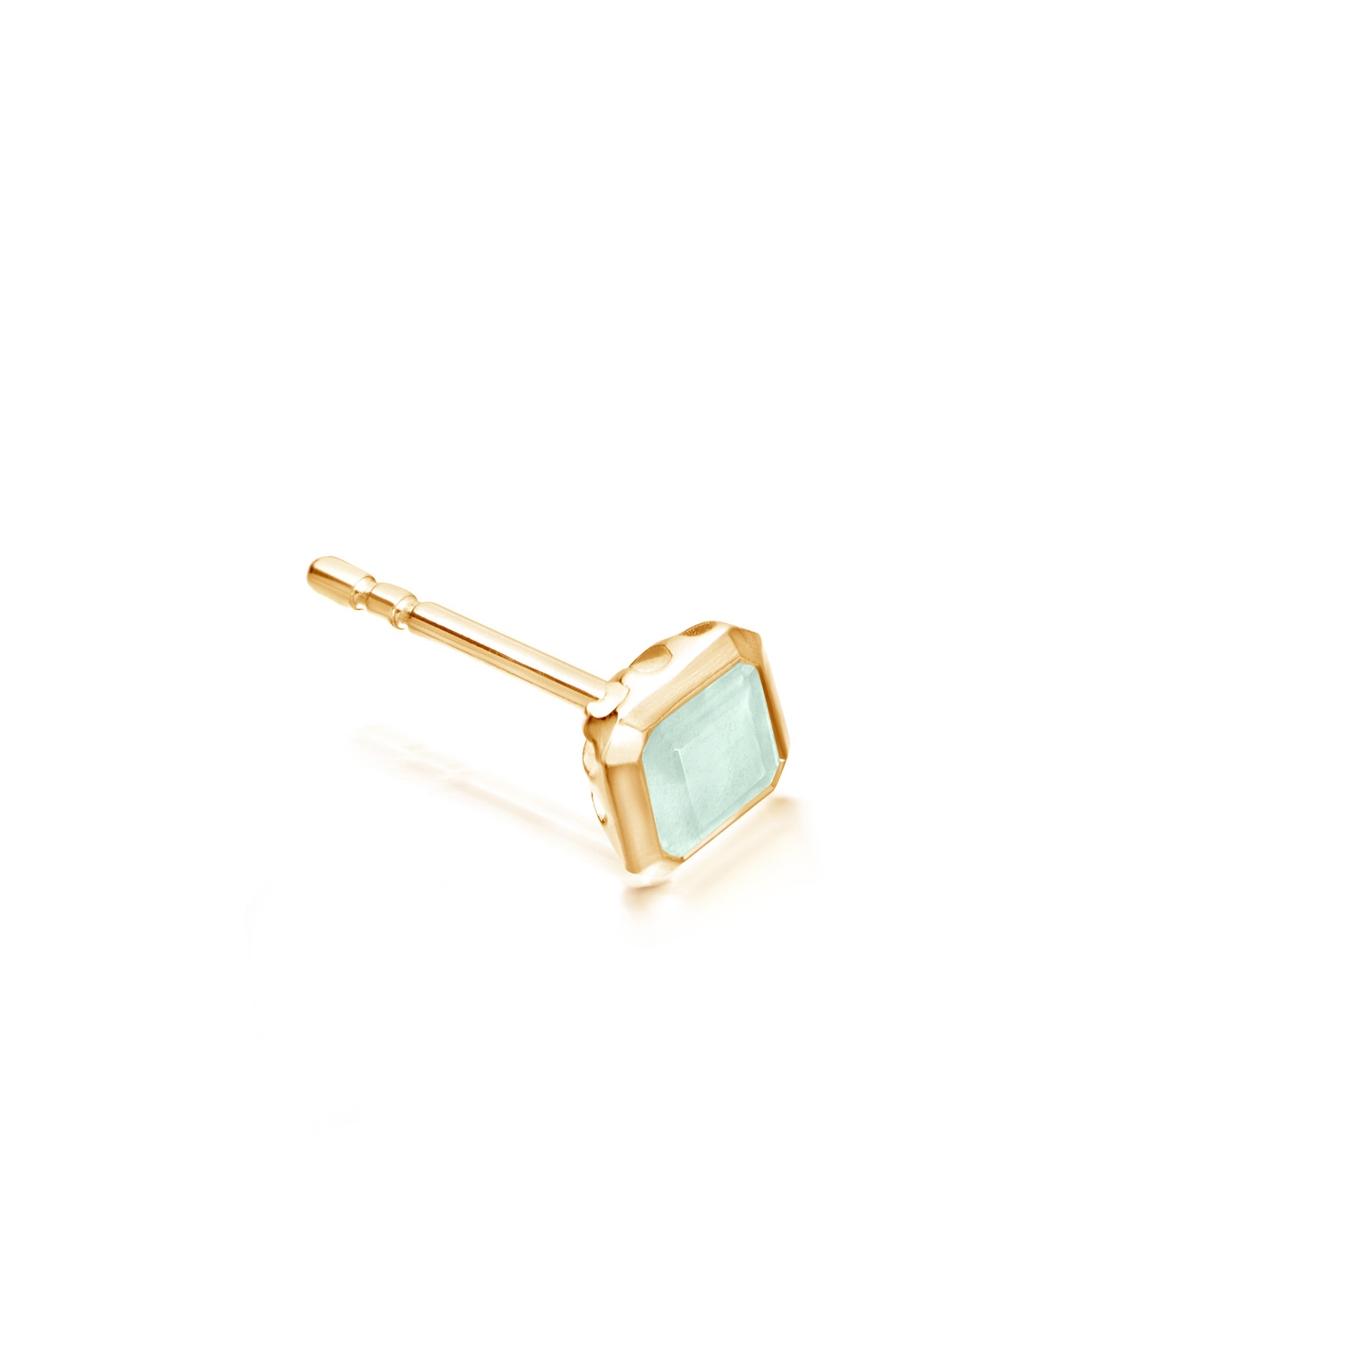 Aqua Quartz Square Prismic Single Stud Earring